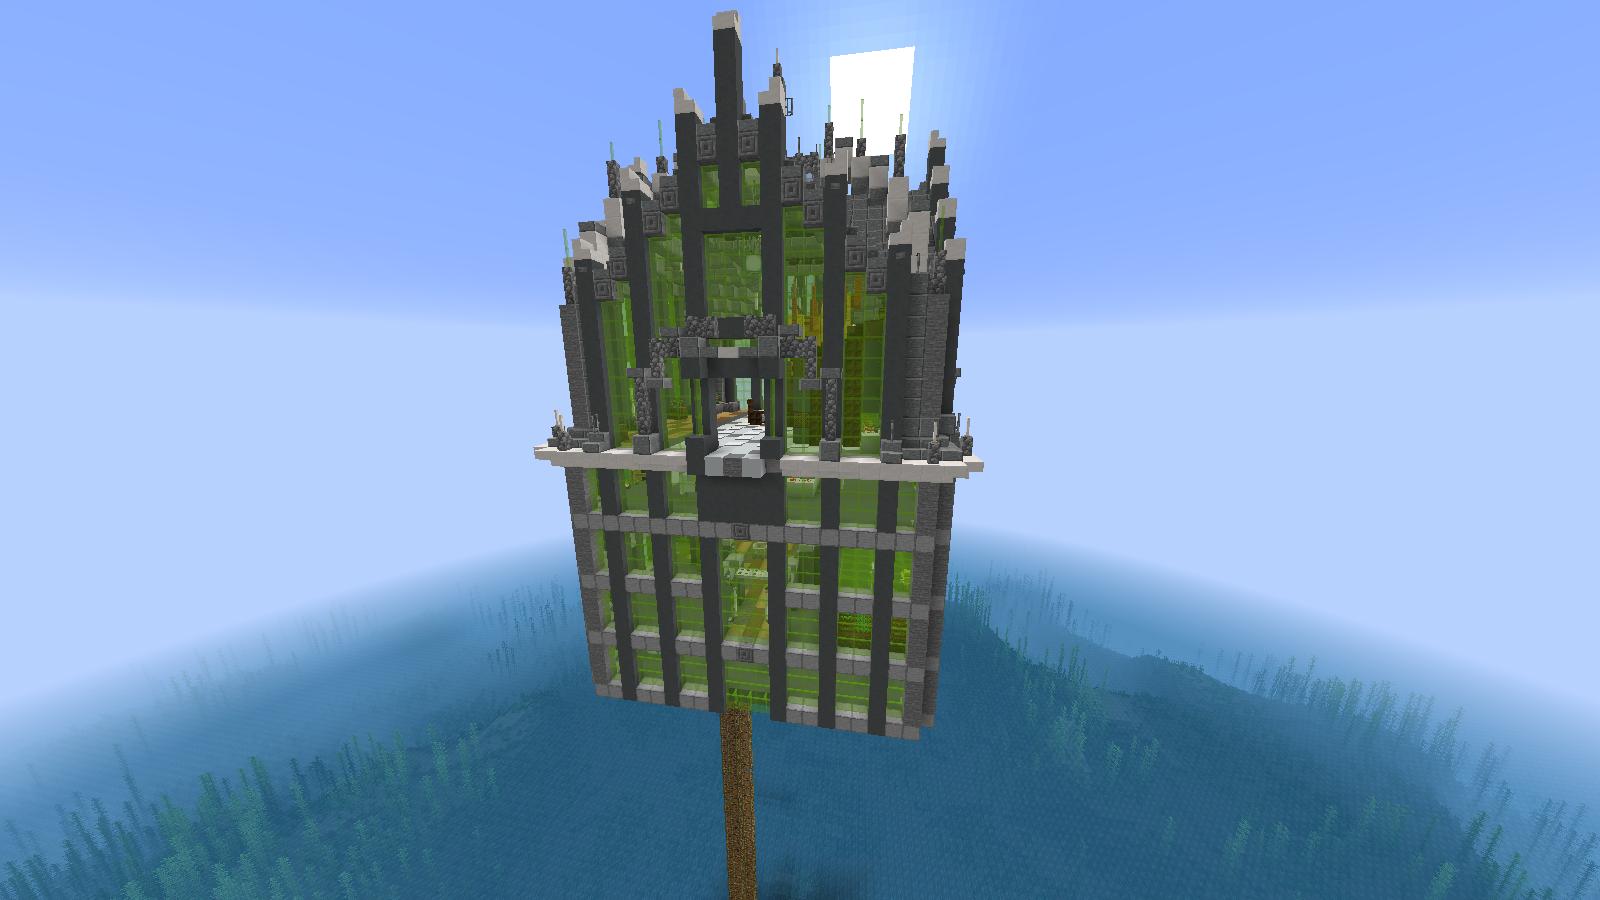 Testificate Tower